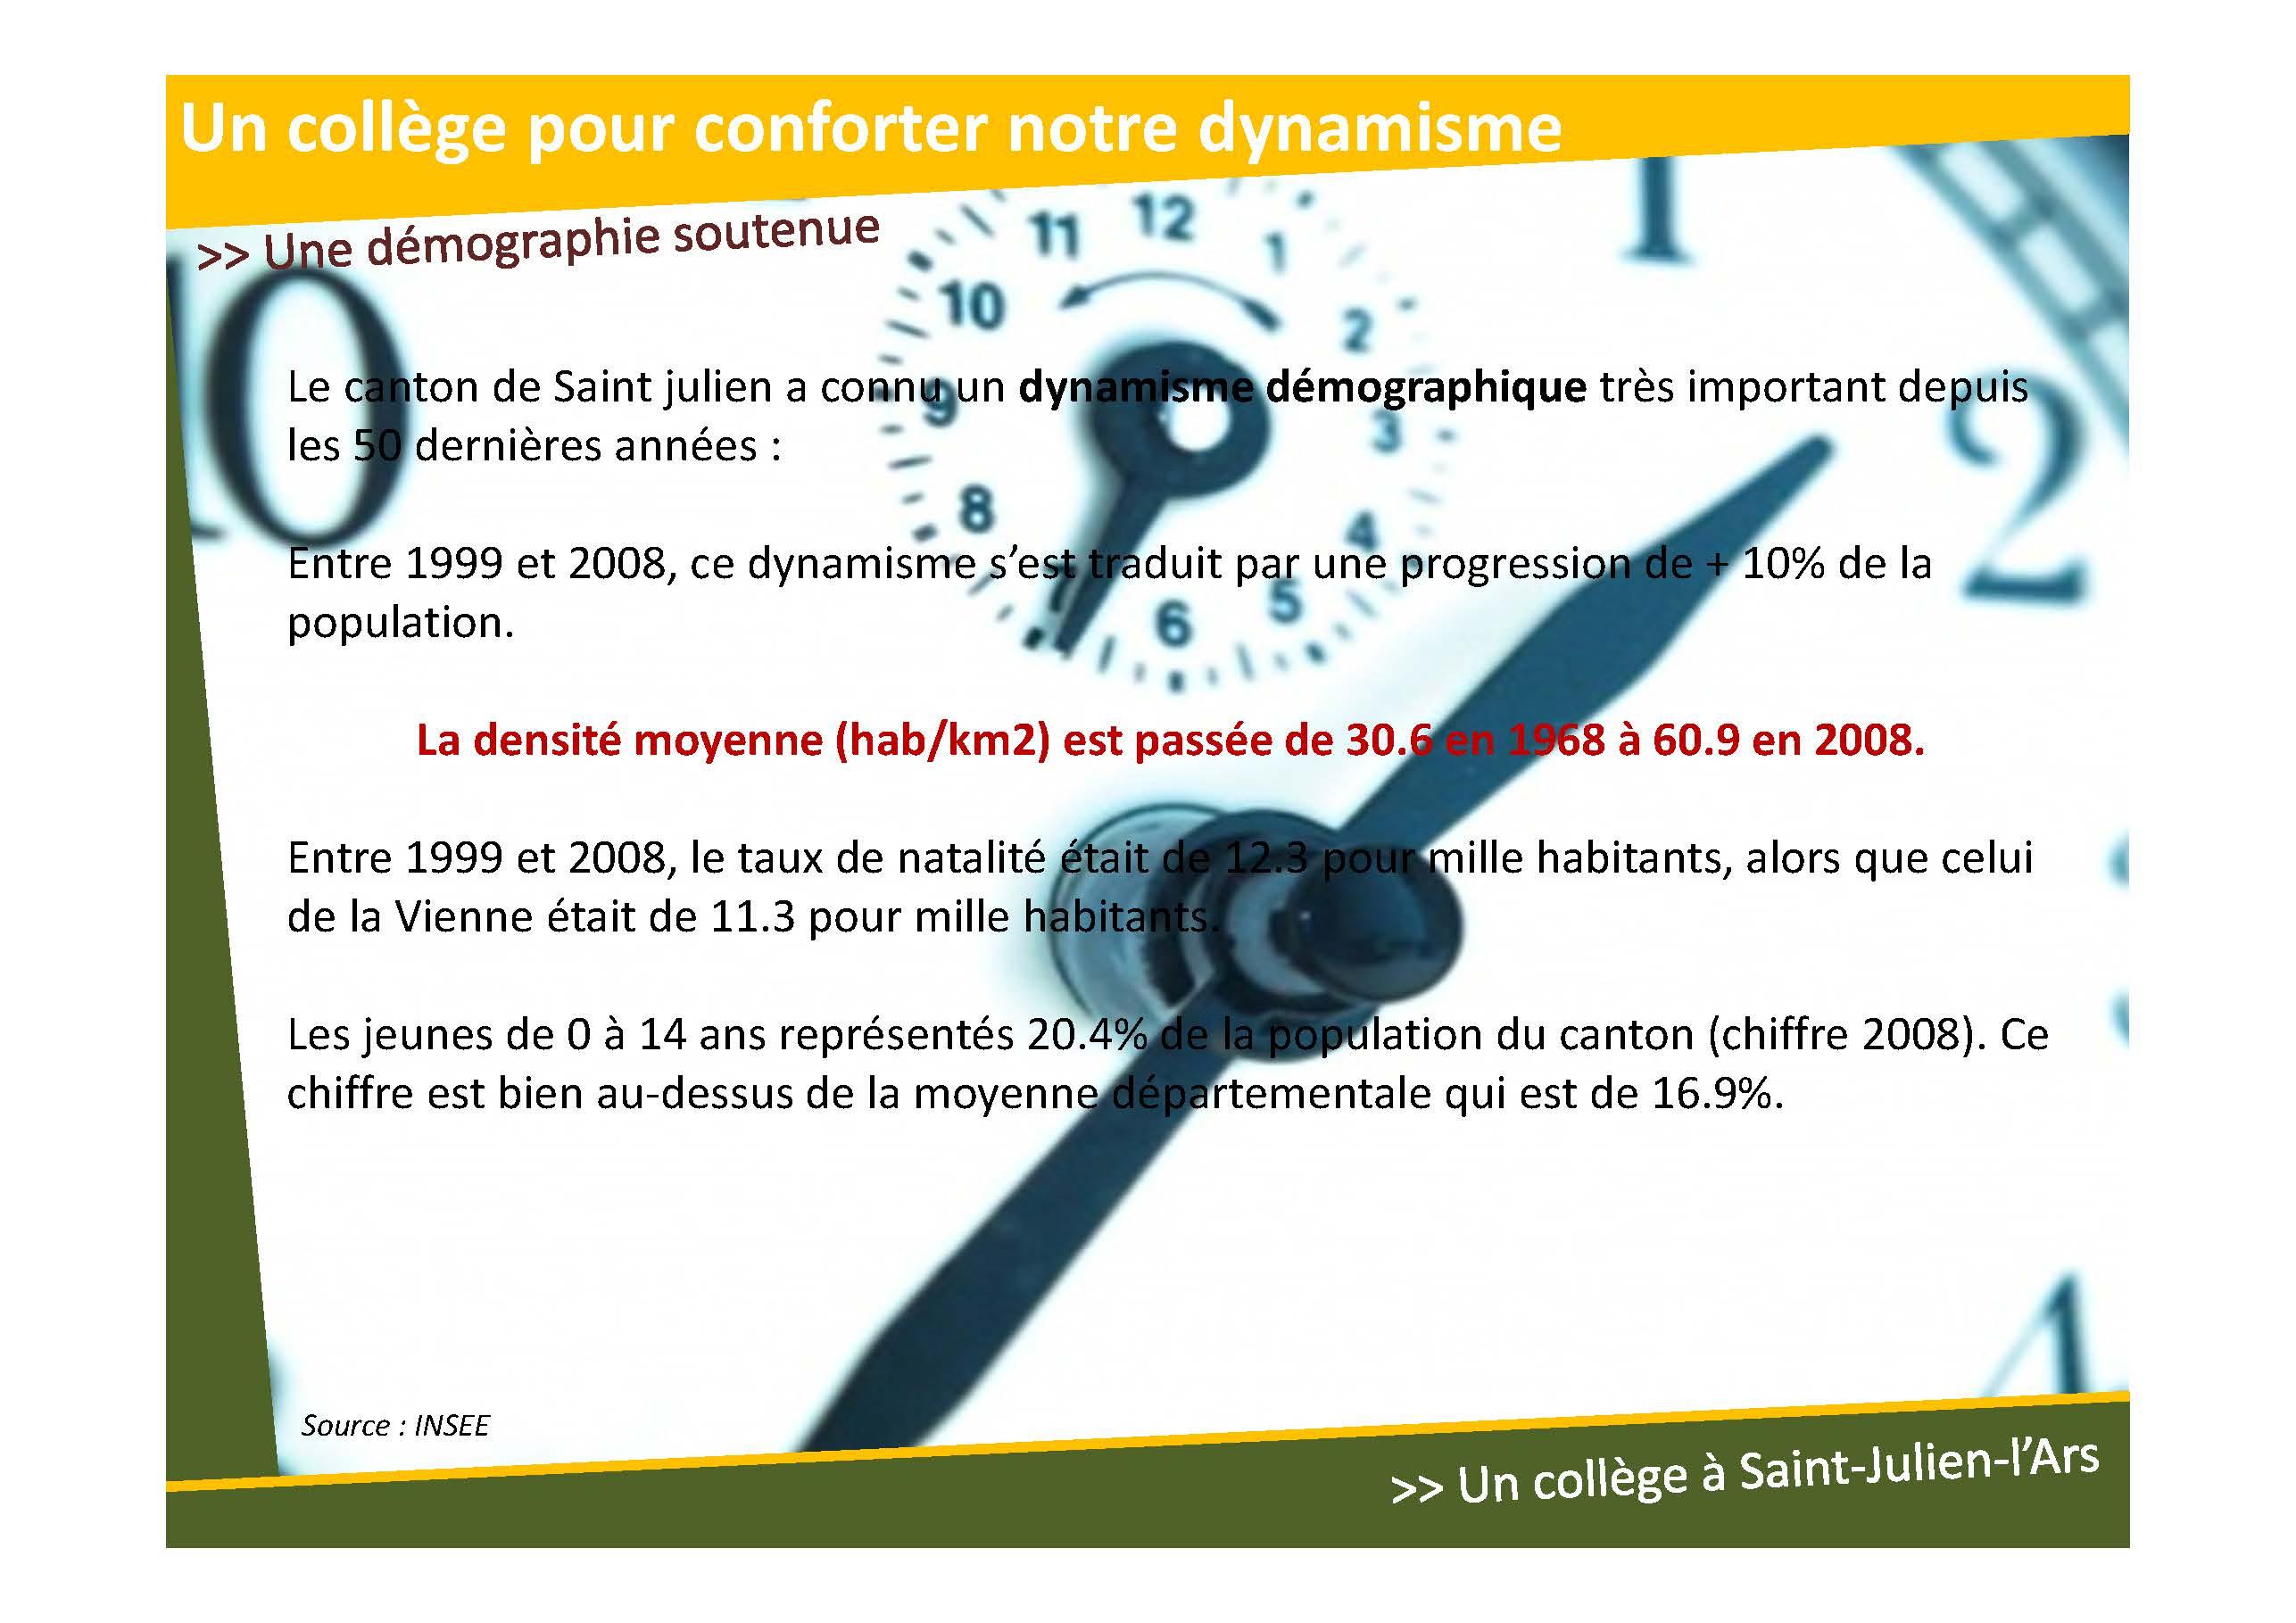 xaviermoinier-college_page_17